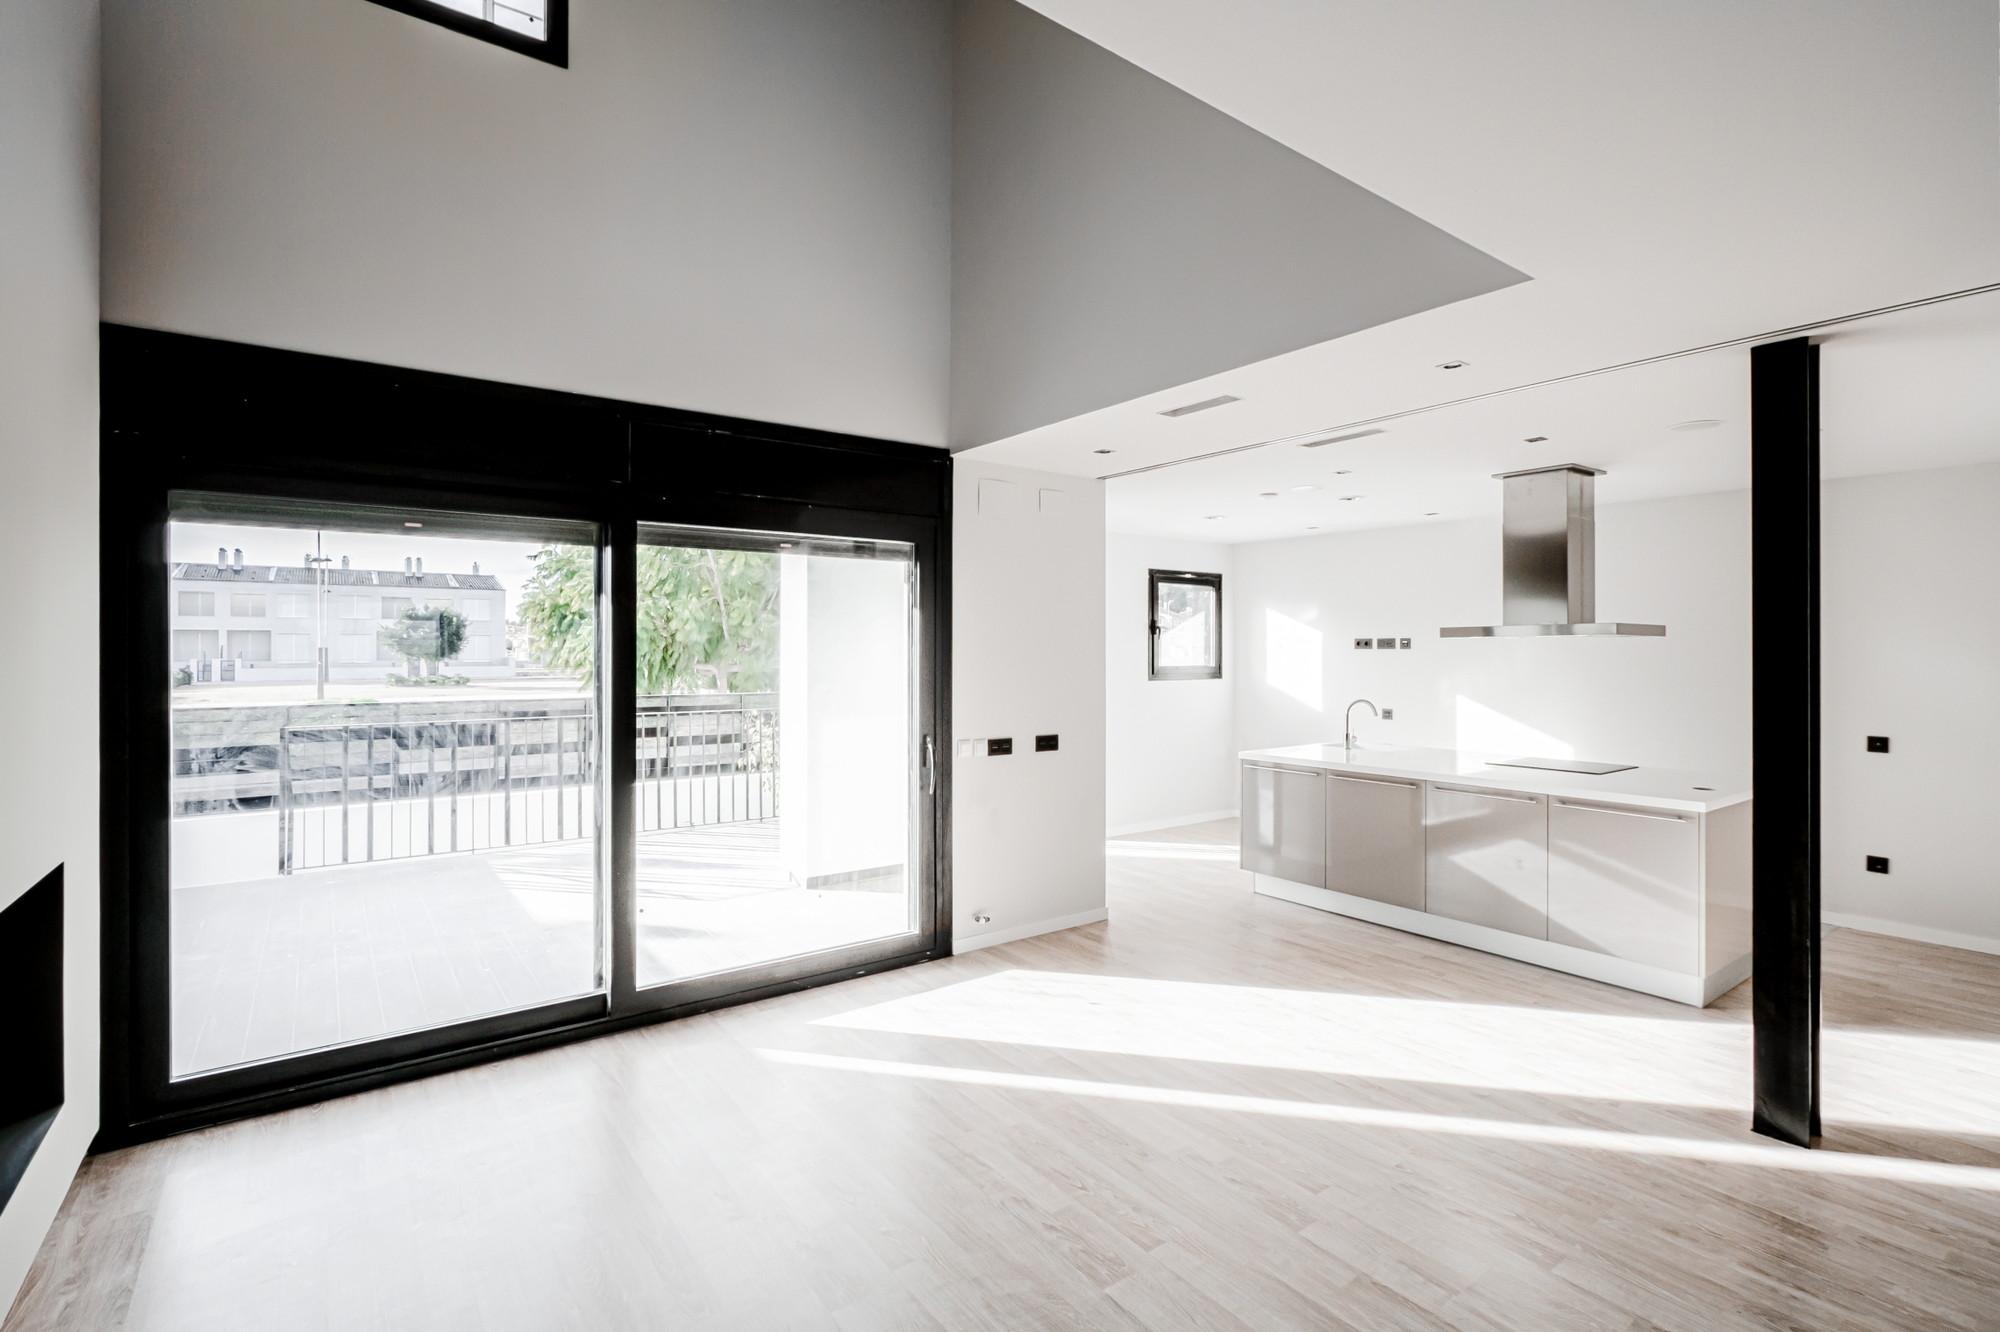 Interior Light Single Family Housing,© Germán Cabo Arnal